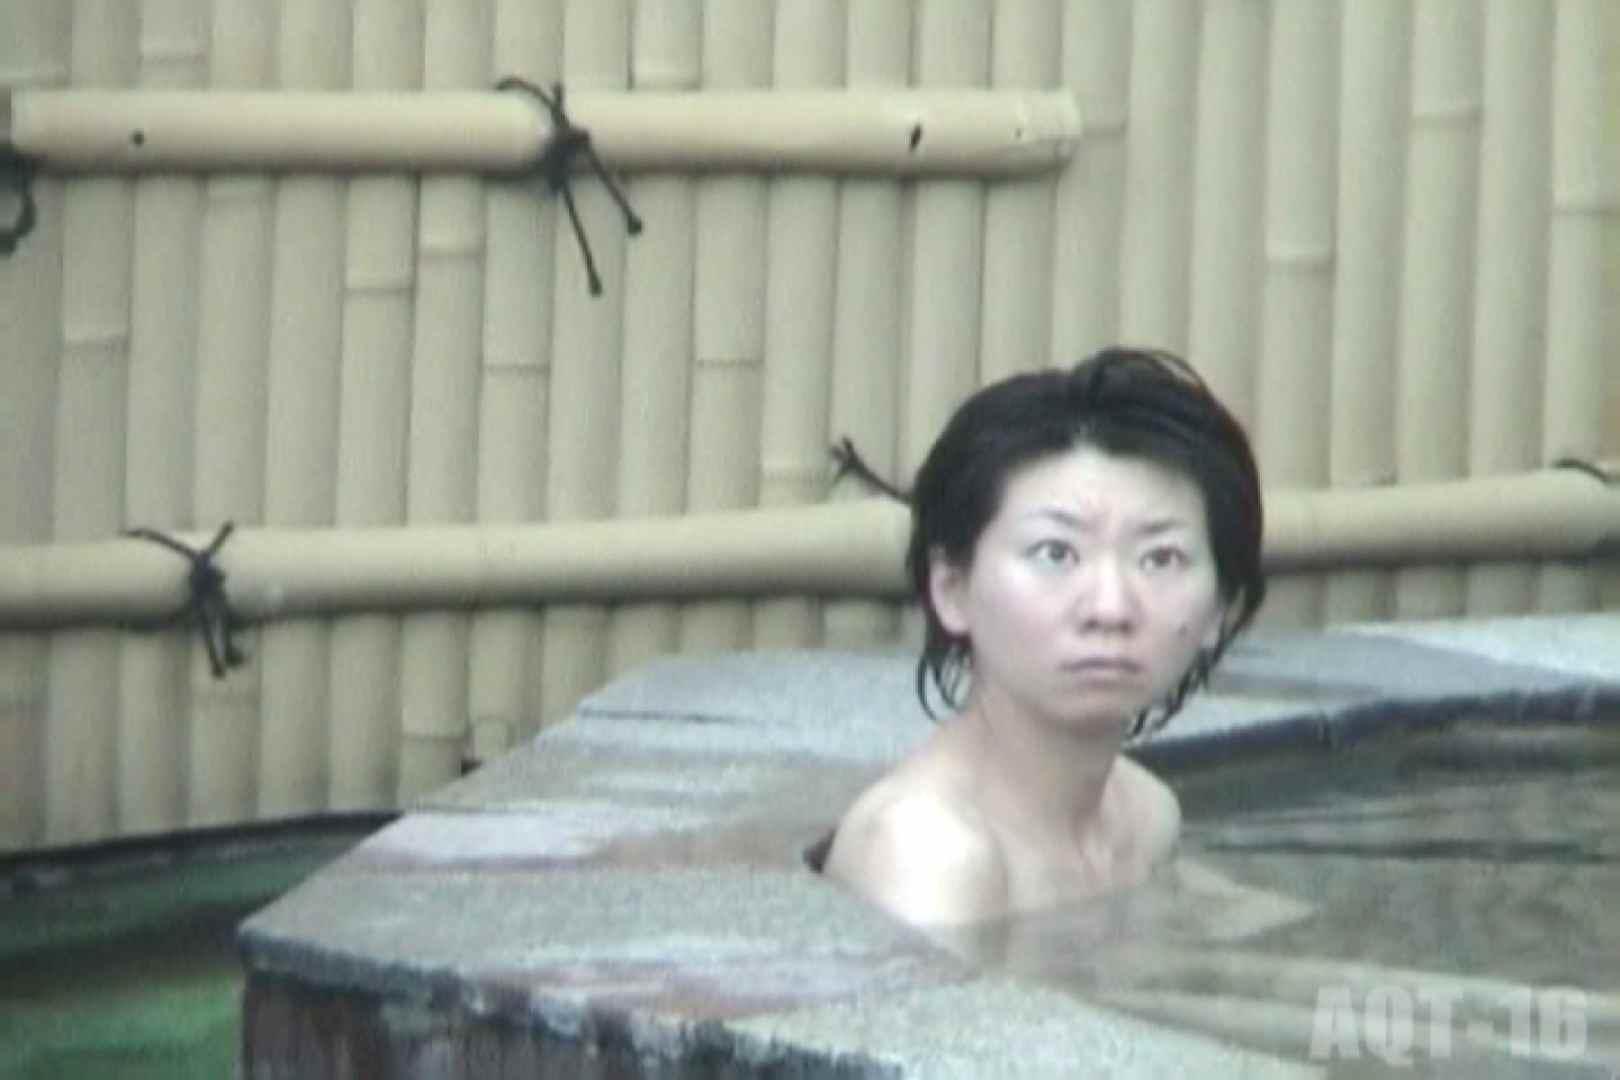 Aquaな露天風呂Vol.842 露天風呂編 | 盗撮シリーズ  82PIX 35